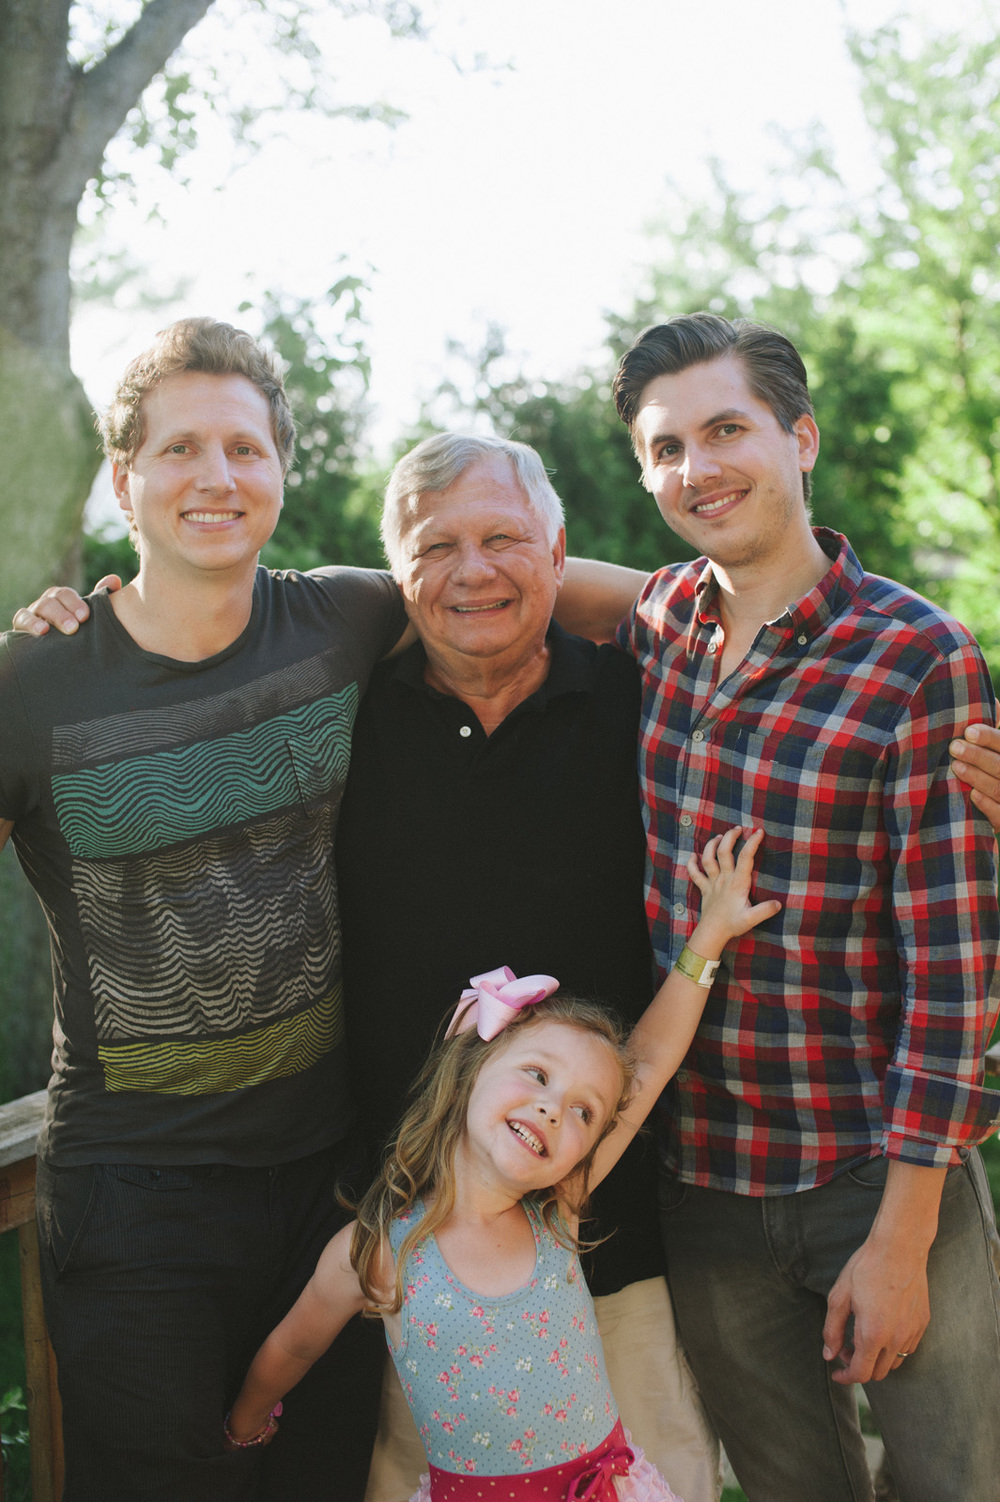 20130616_Fathers_Day__APB5357.jpg